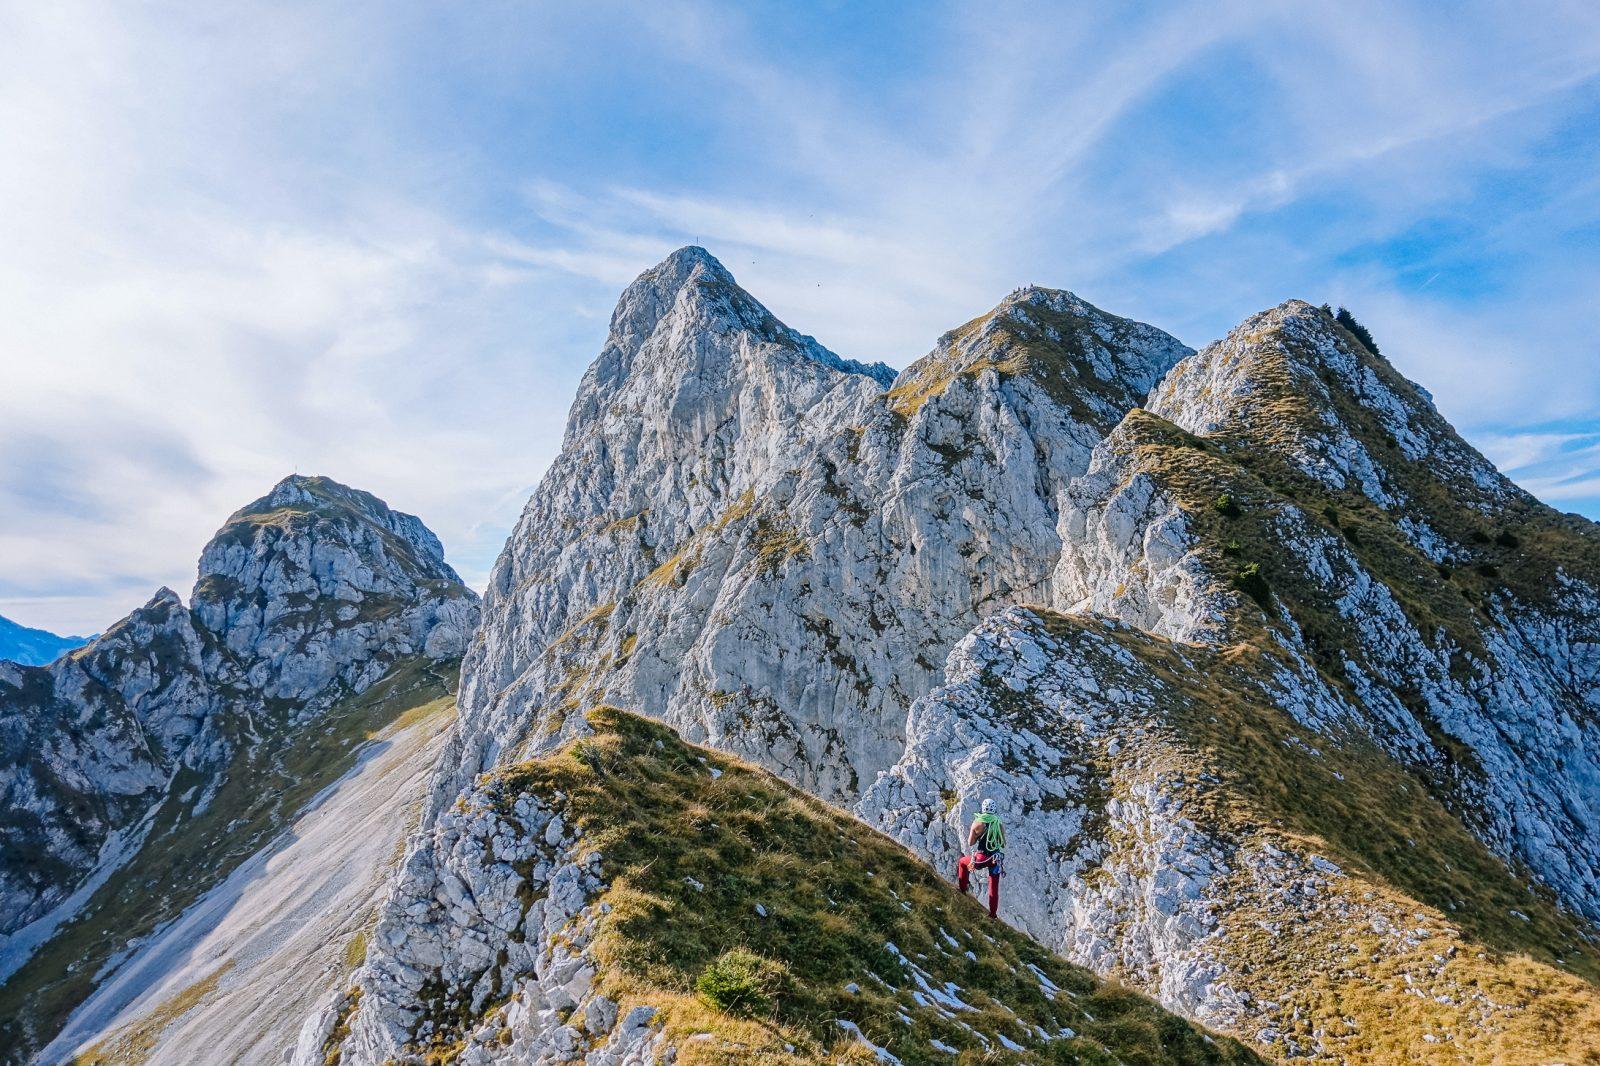 Spannender Fels in der Region Tannheimer Tal, Foto: Simon Schöpf | Climbers Paradise